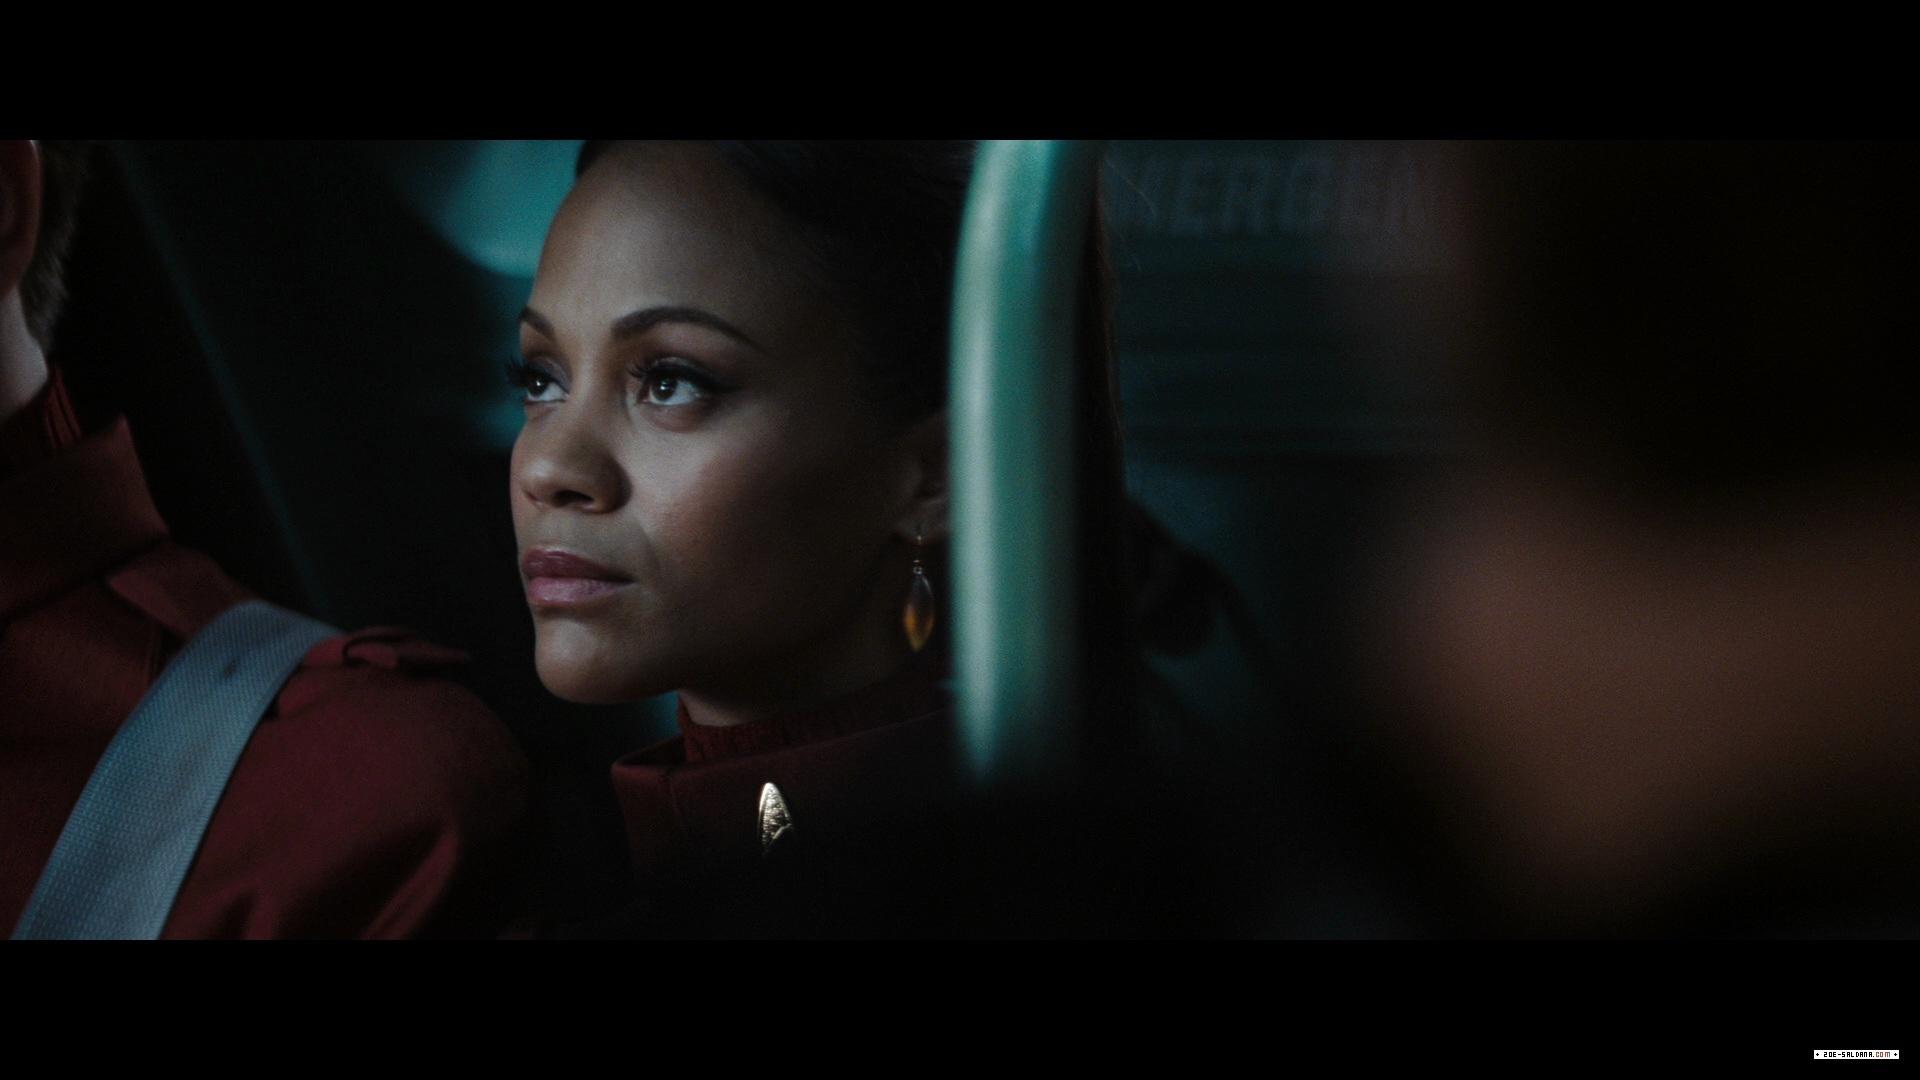 Zoe-Saldana-Star-Trek-screencaps-zoe-saldana-9859847-1920-1080 jpgZoe Saldana Star Trek